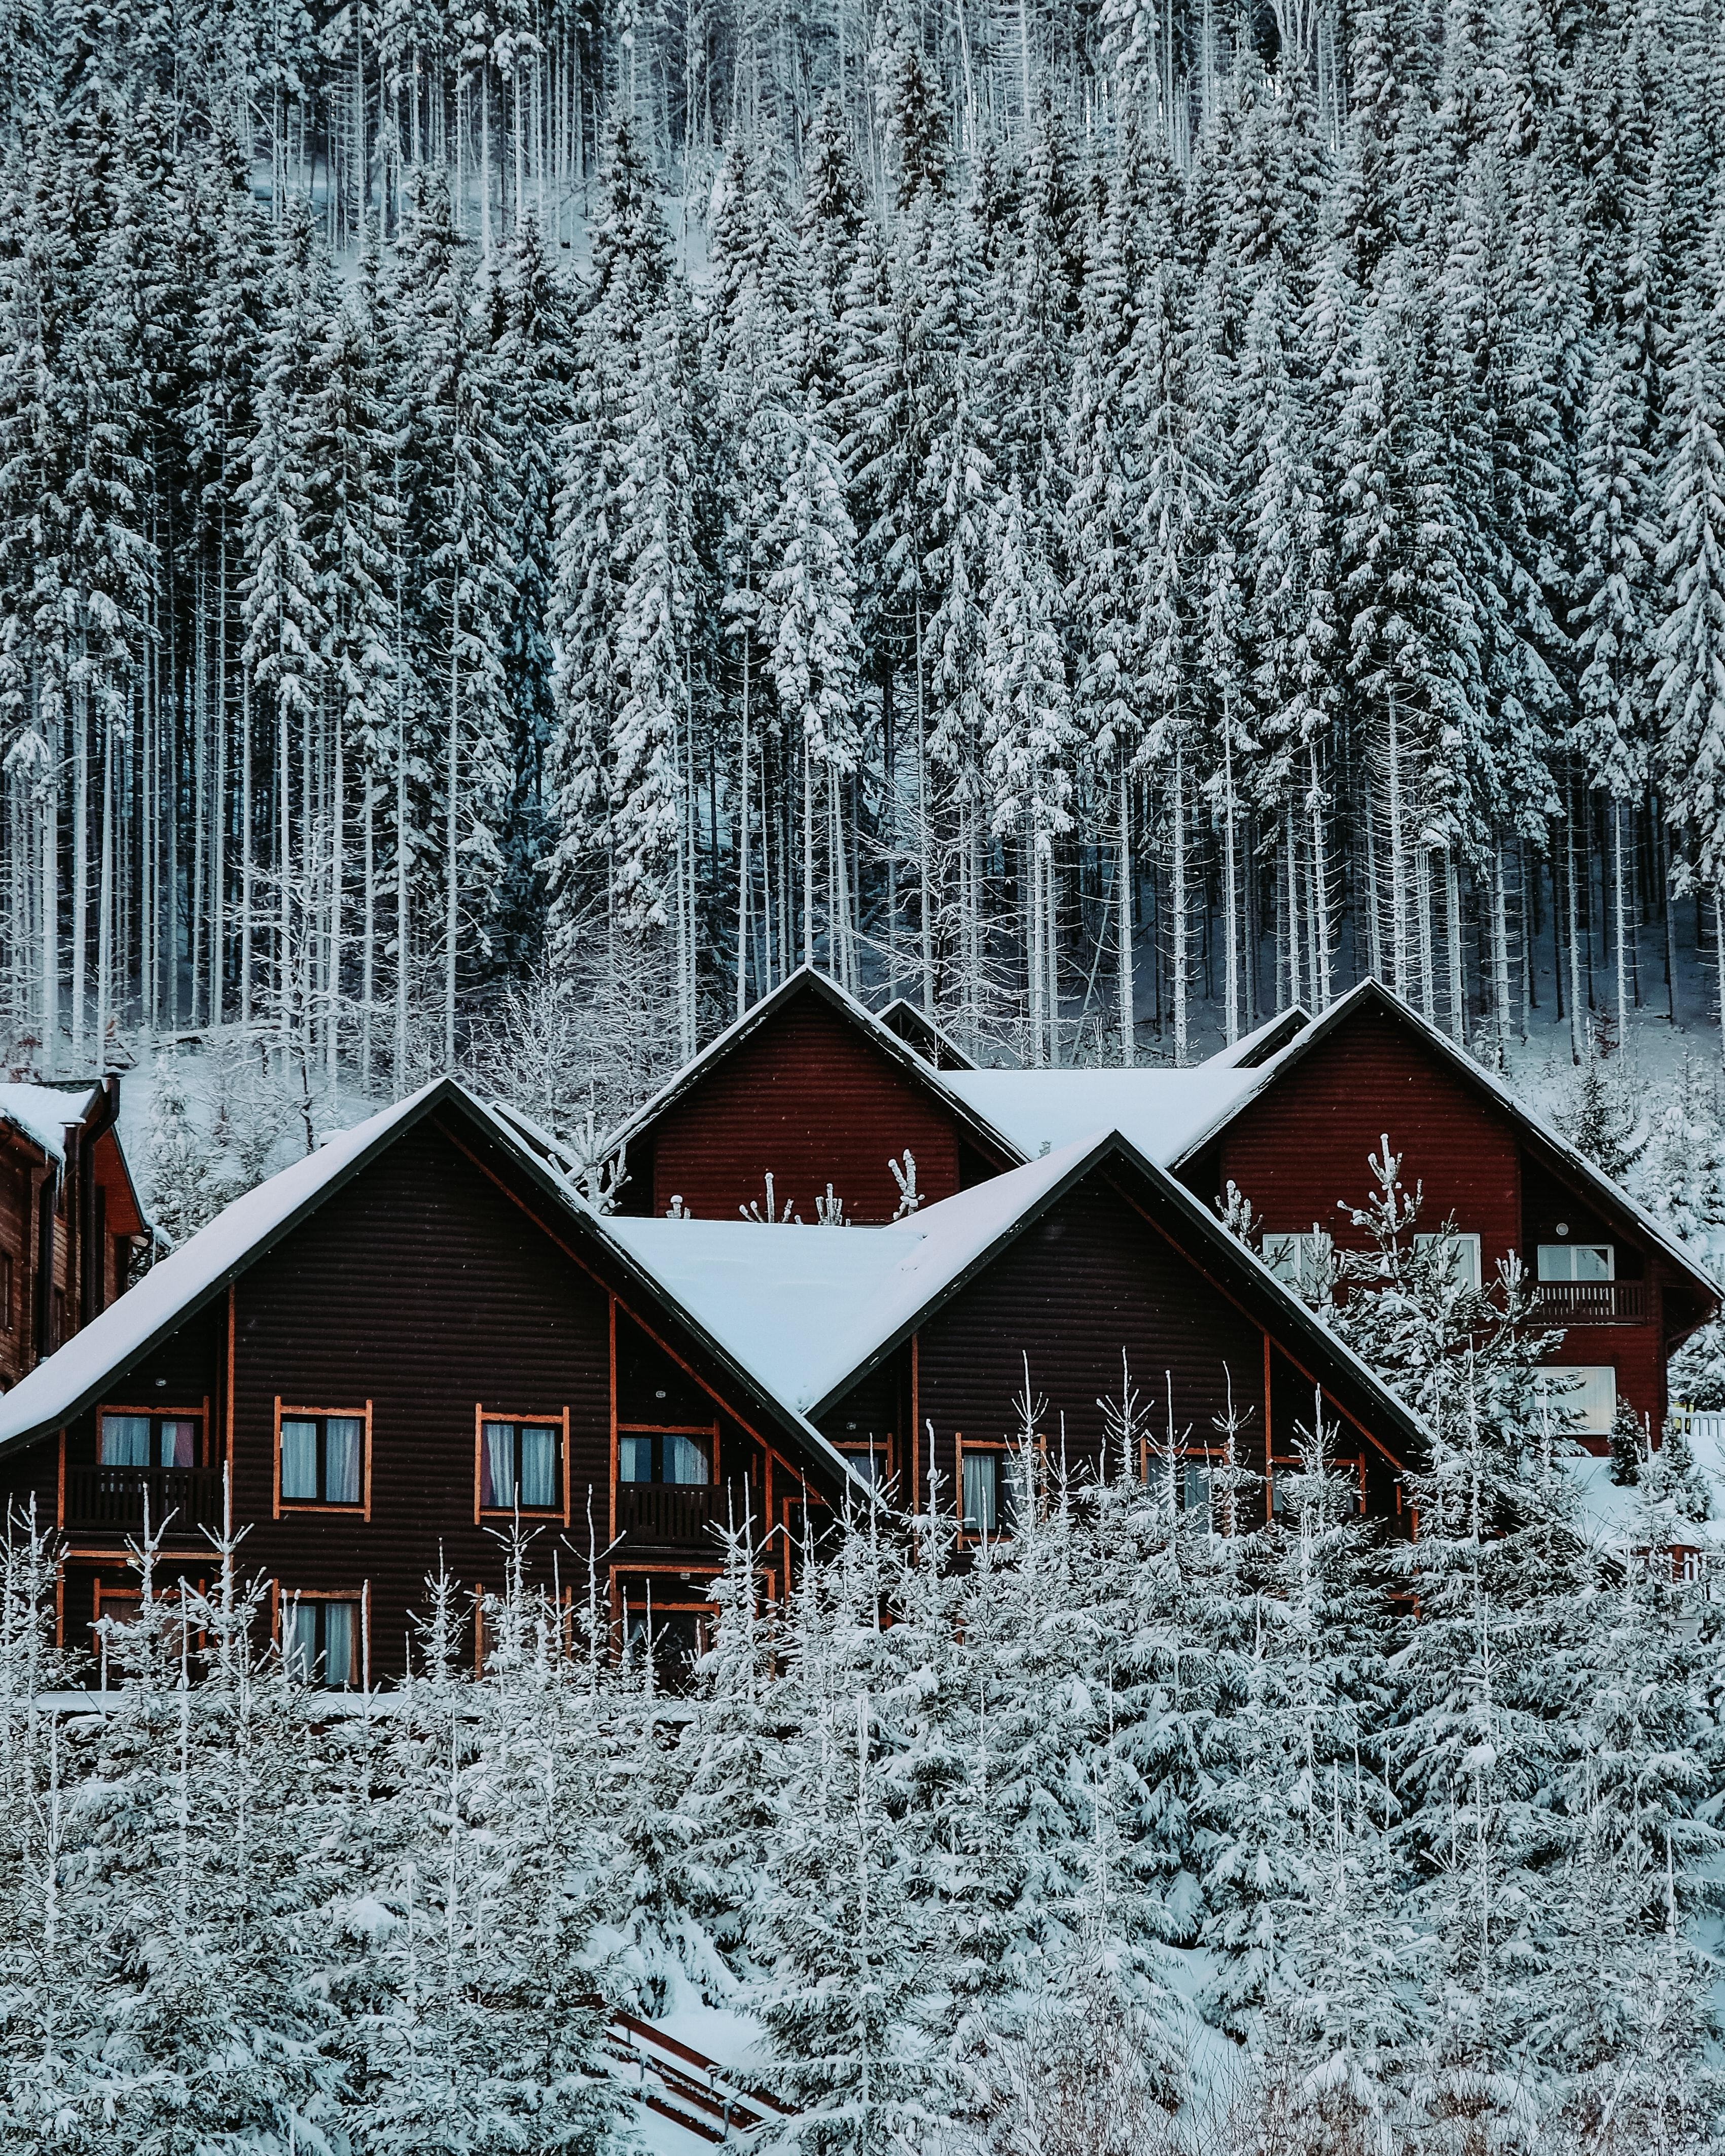 68257 Заставки и Обои Дома на телефон. Скачать Дома, Зима, Природа, Снег, Лес картинки бесплатно